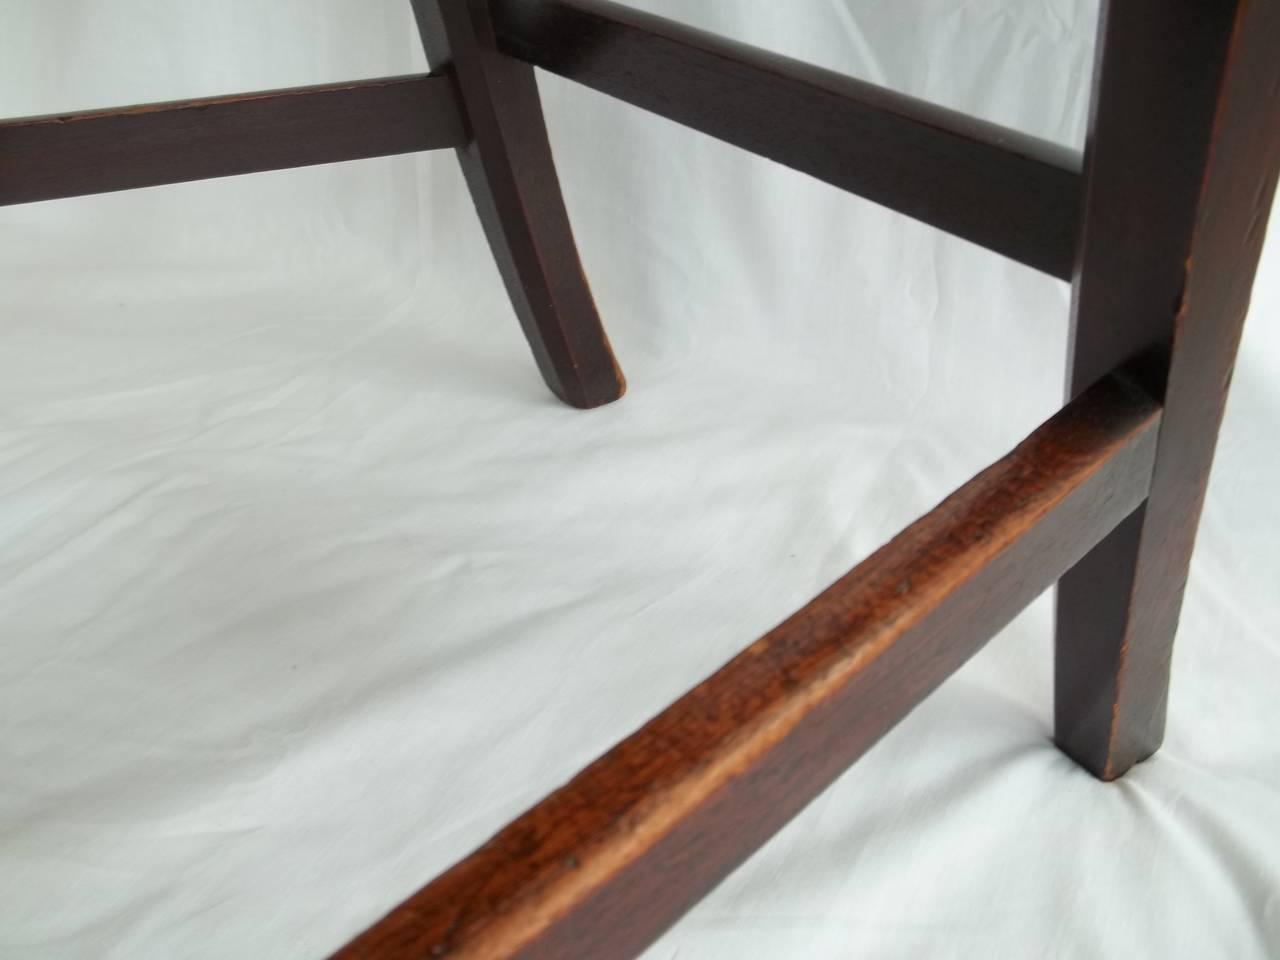 Elegant 18th Century Hepplewhite Side Chair in Mahogany, English circa 1785 For Sale 5